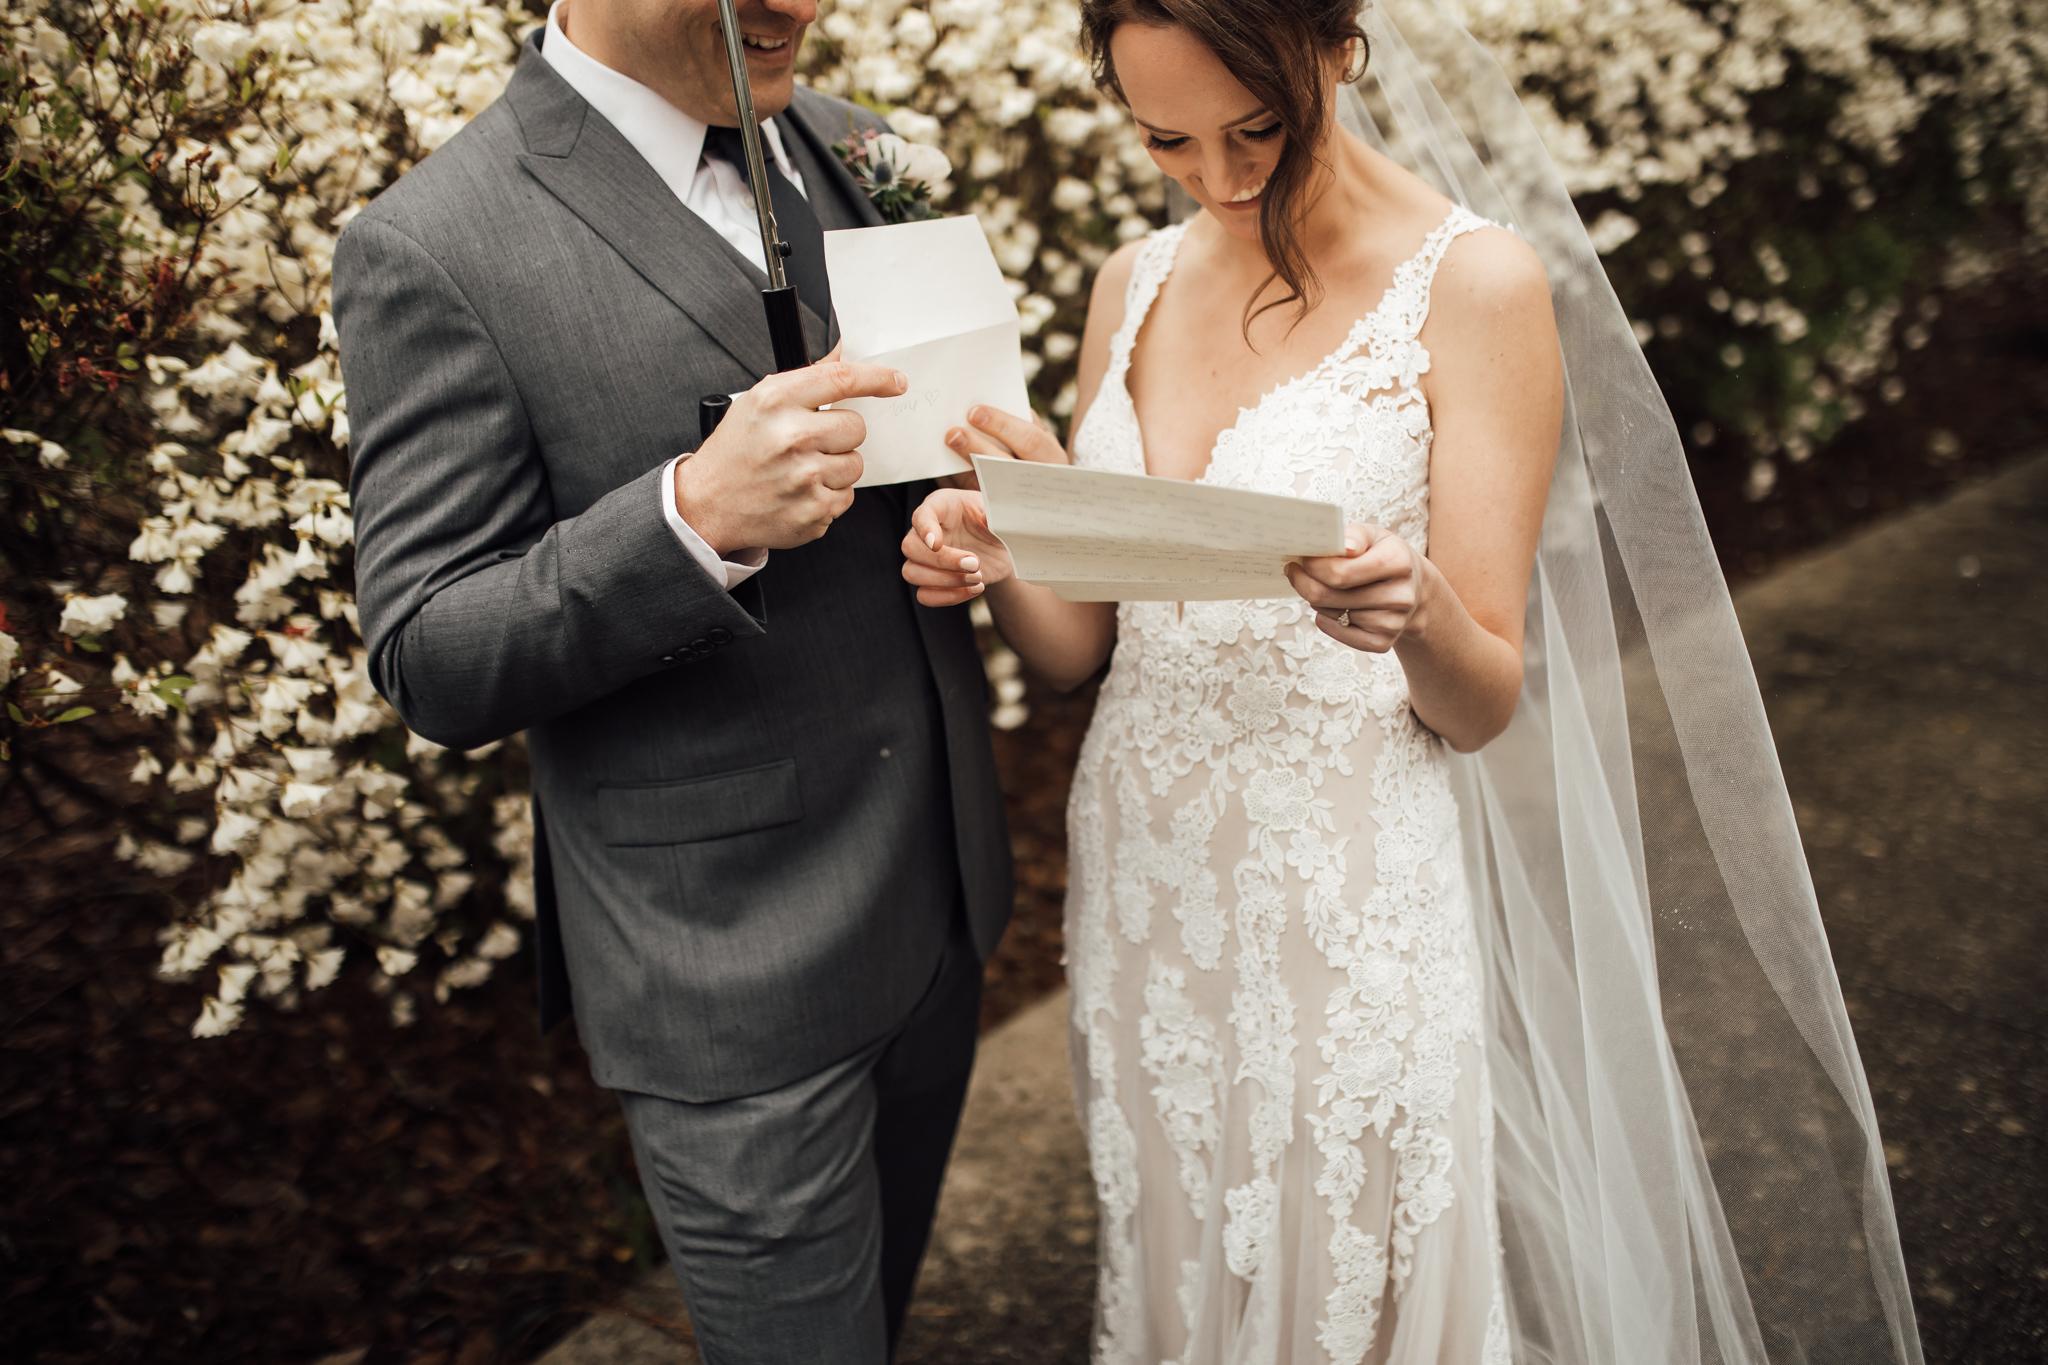 birmingham-al-wedding-photographer-the-warmth-around-you (5 of 13).jpg